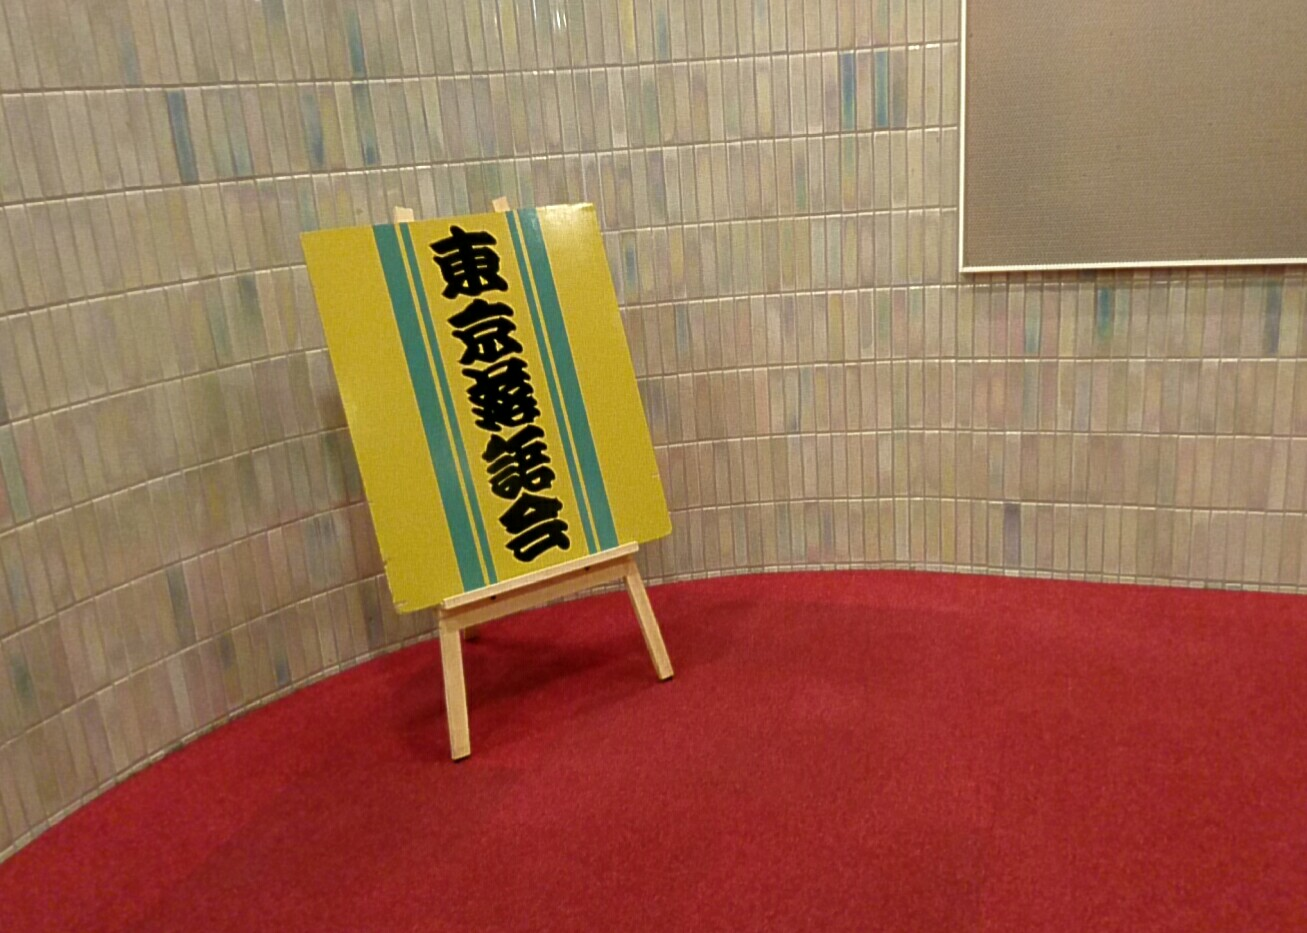 東京落語会へ